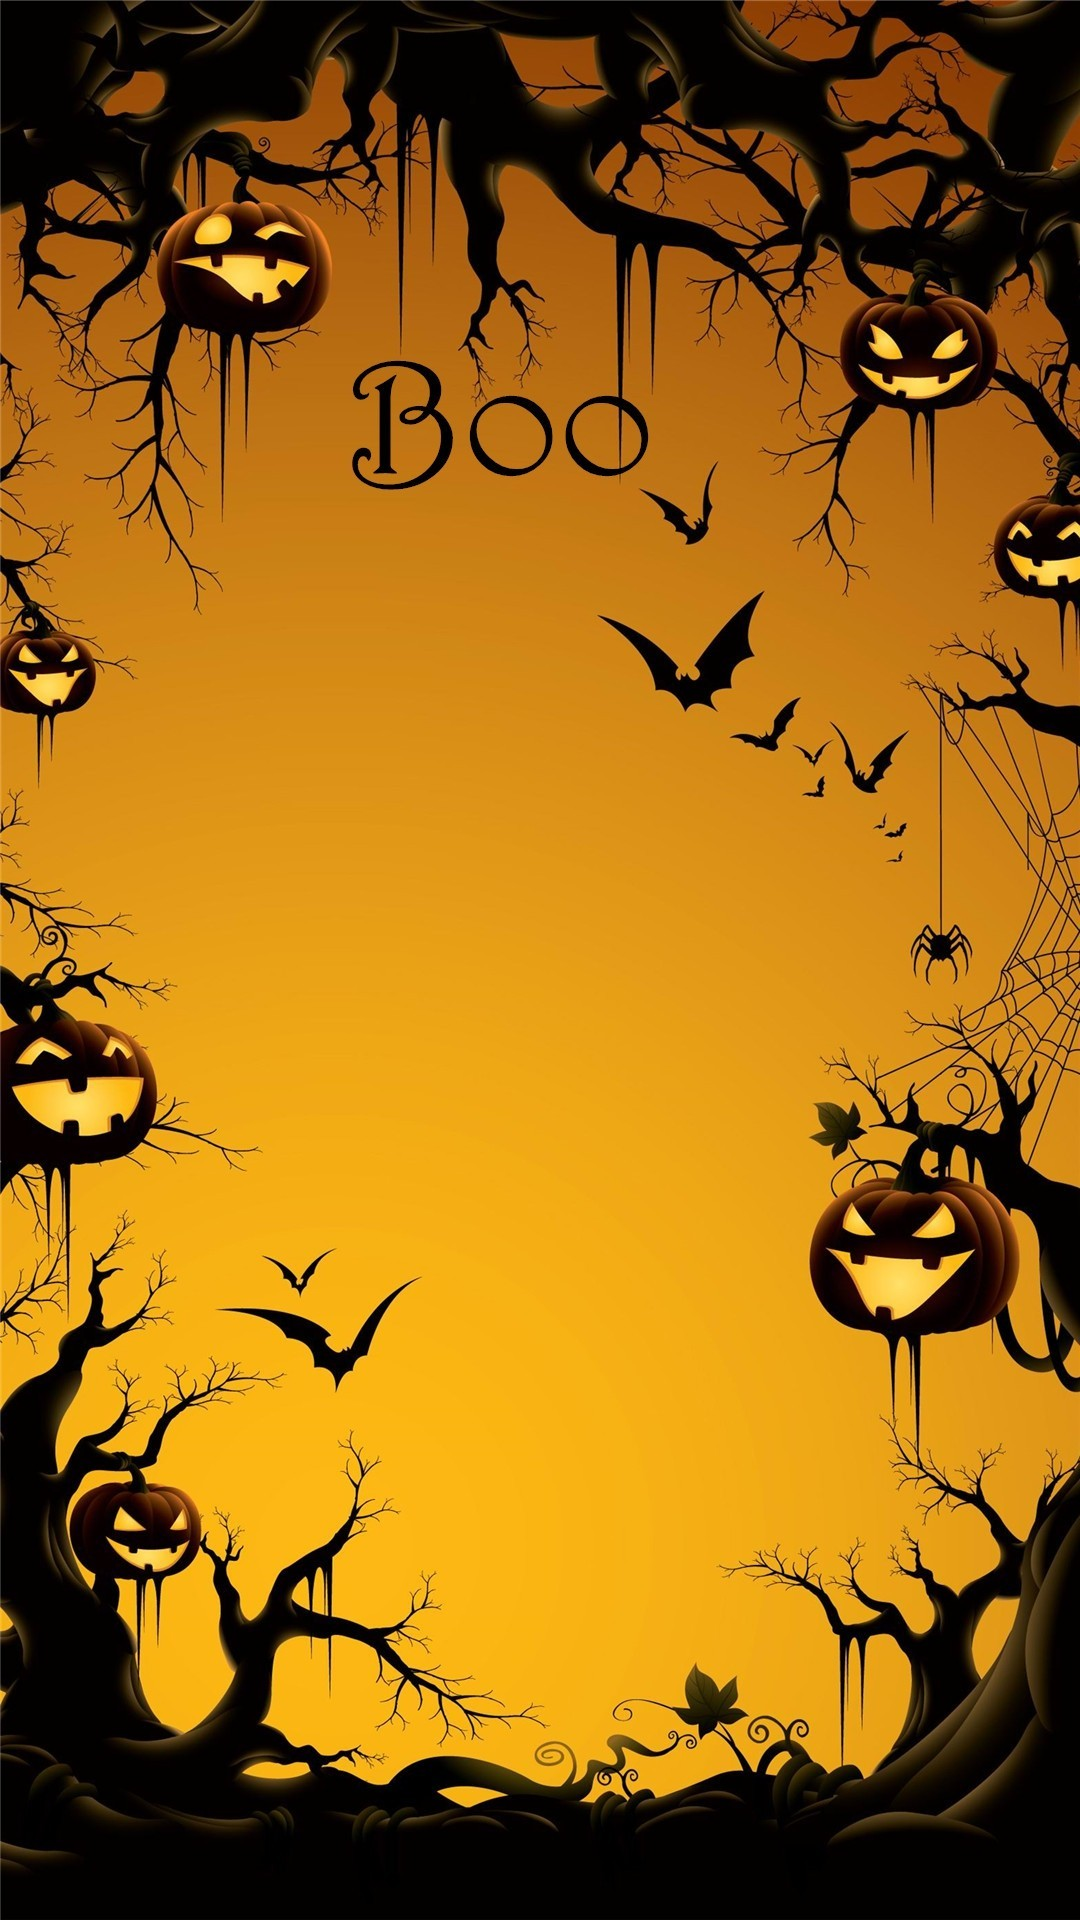 Cute Halloween Iphone Wallpaper 81 Images